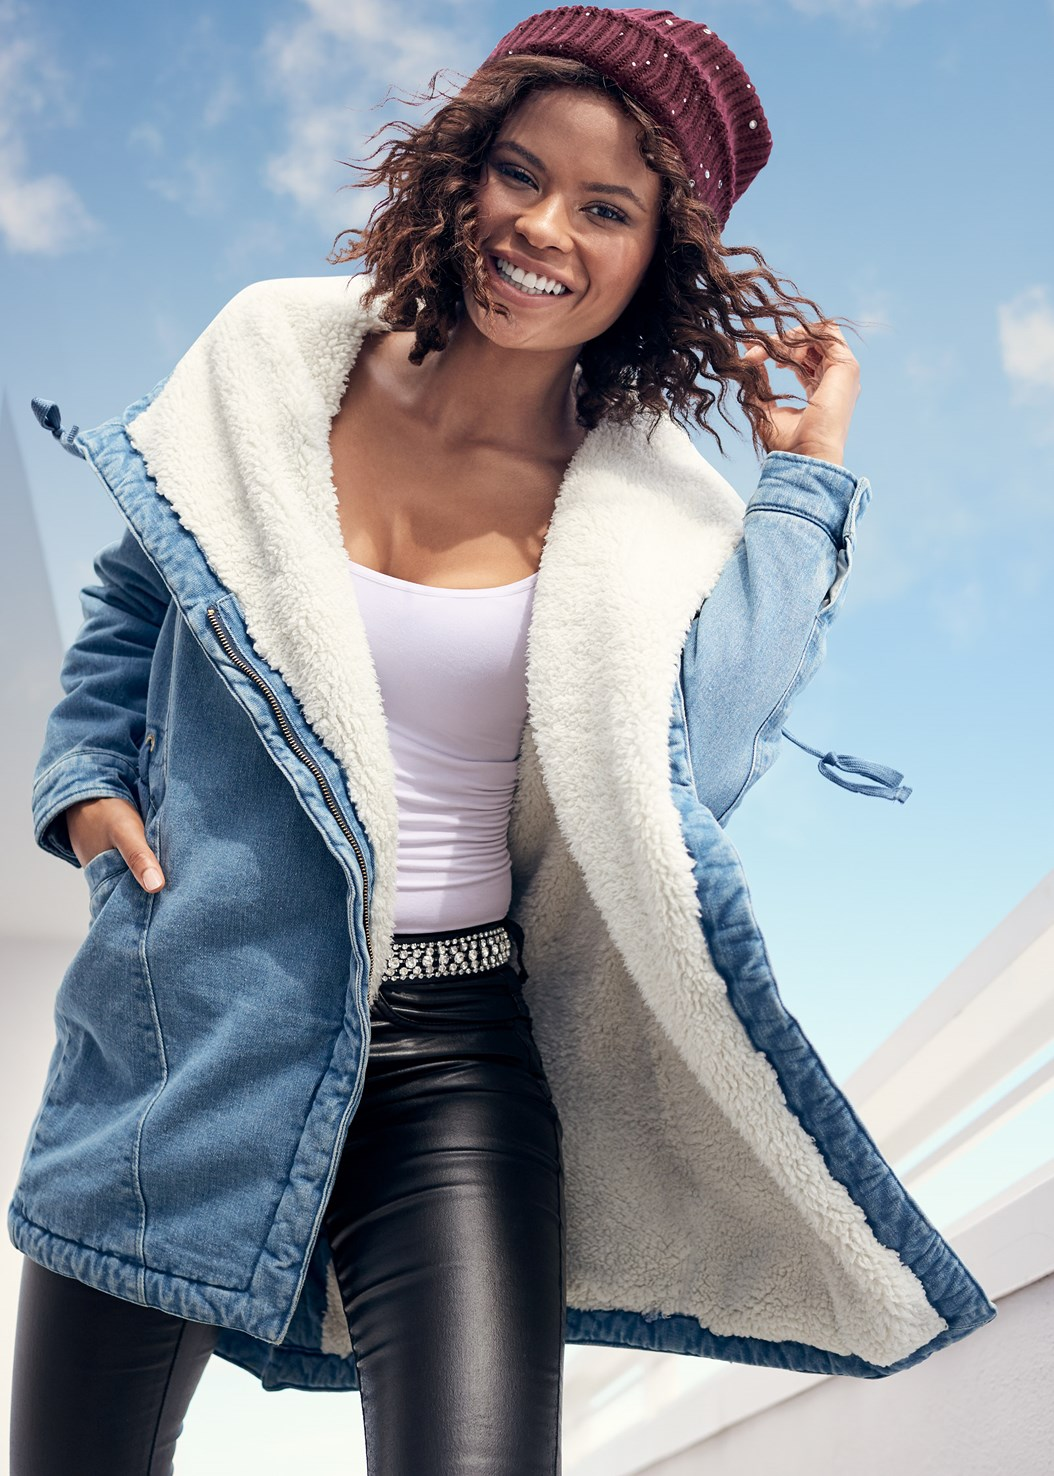 Fleece Lined Denim Coat,Basic Cami Two Pack,Faux Leather Pants,Embellished Waist Belt